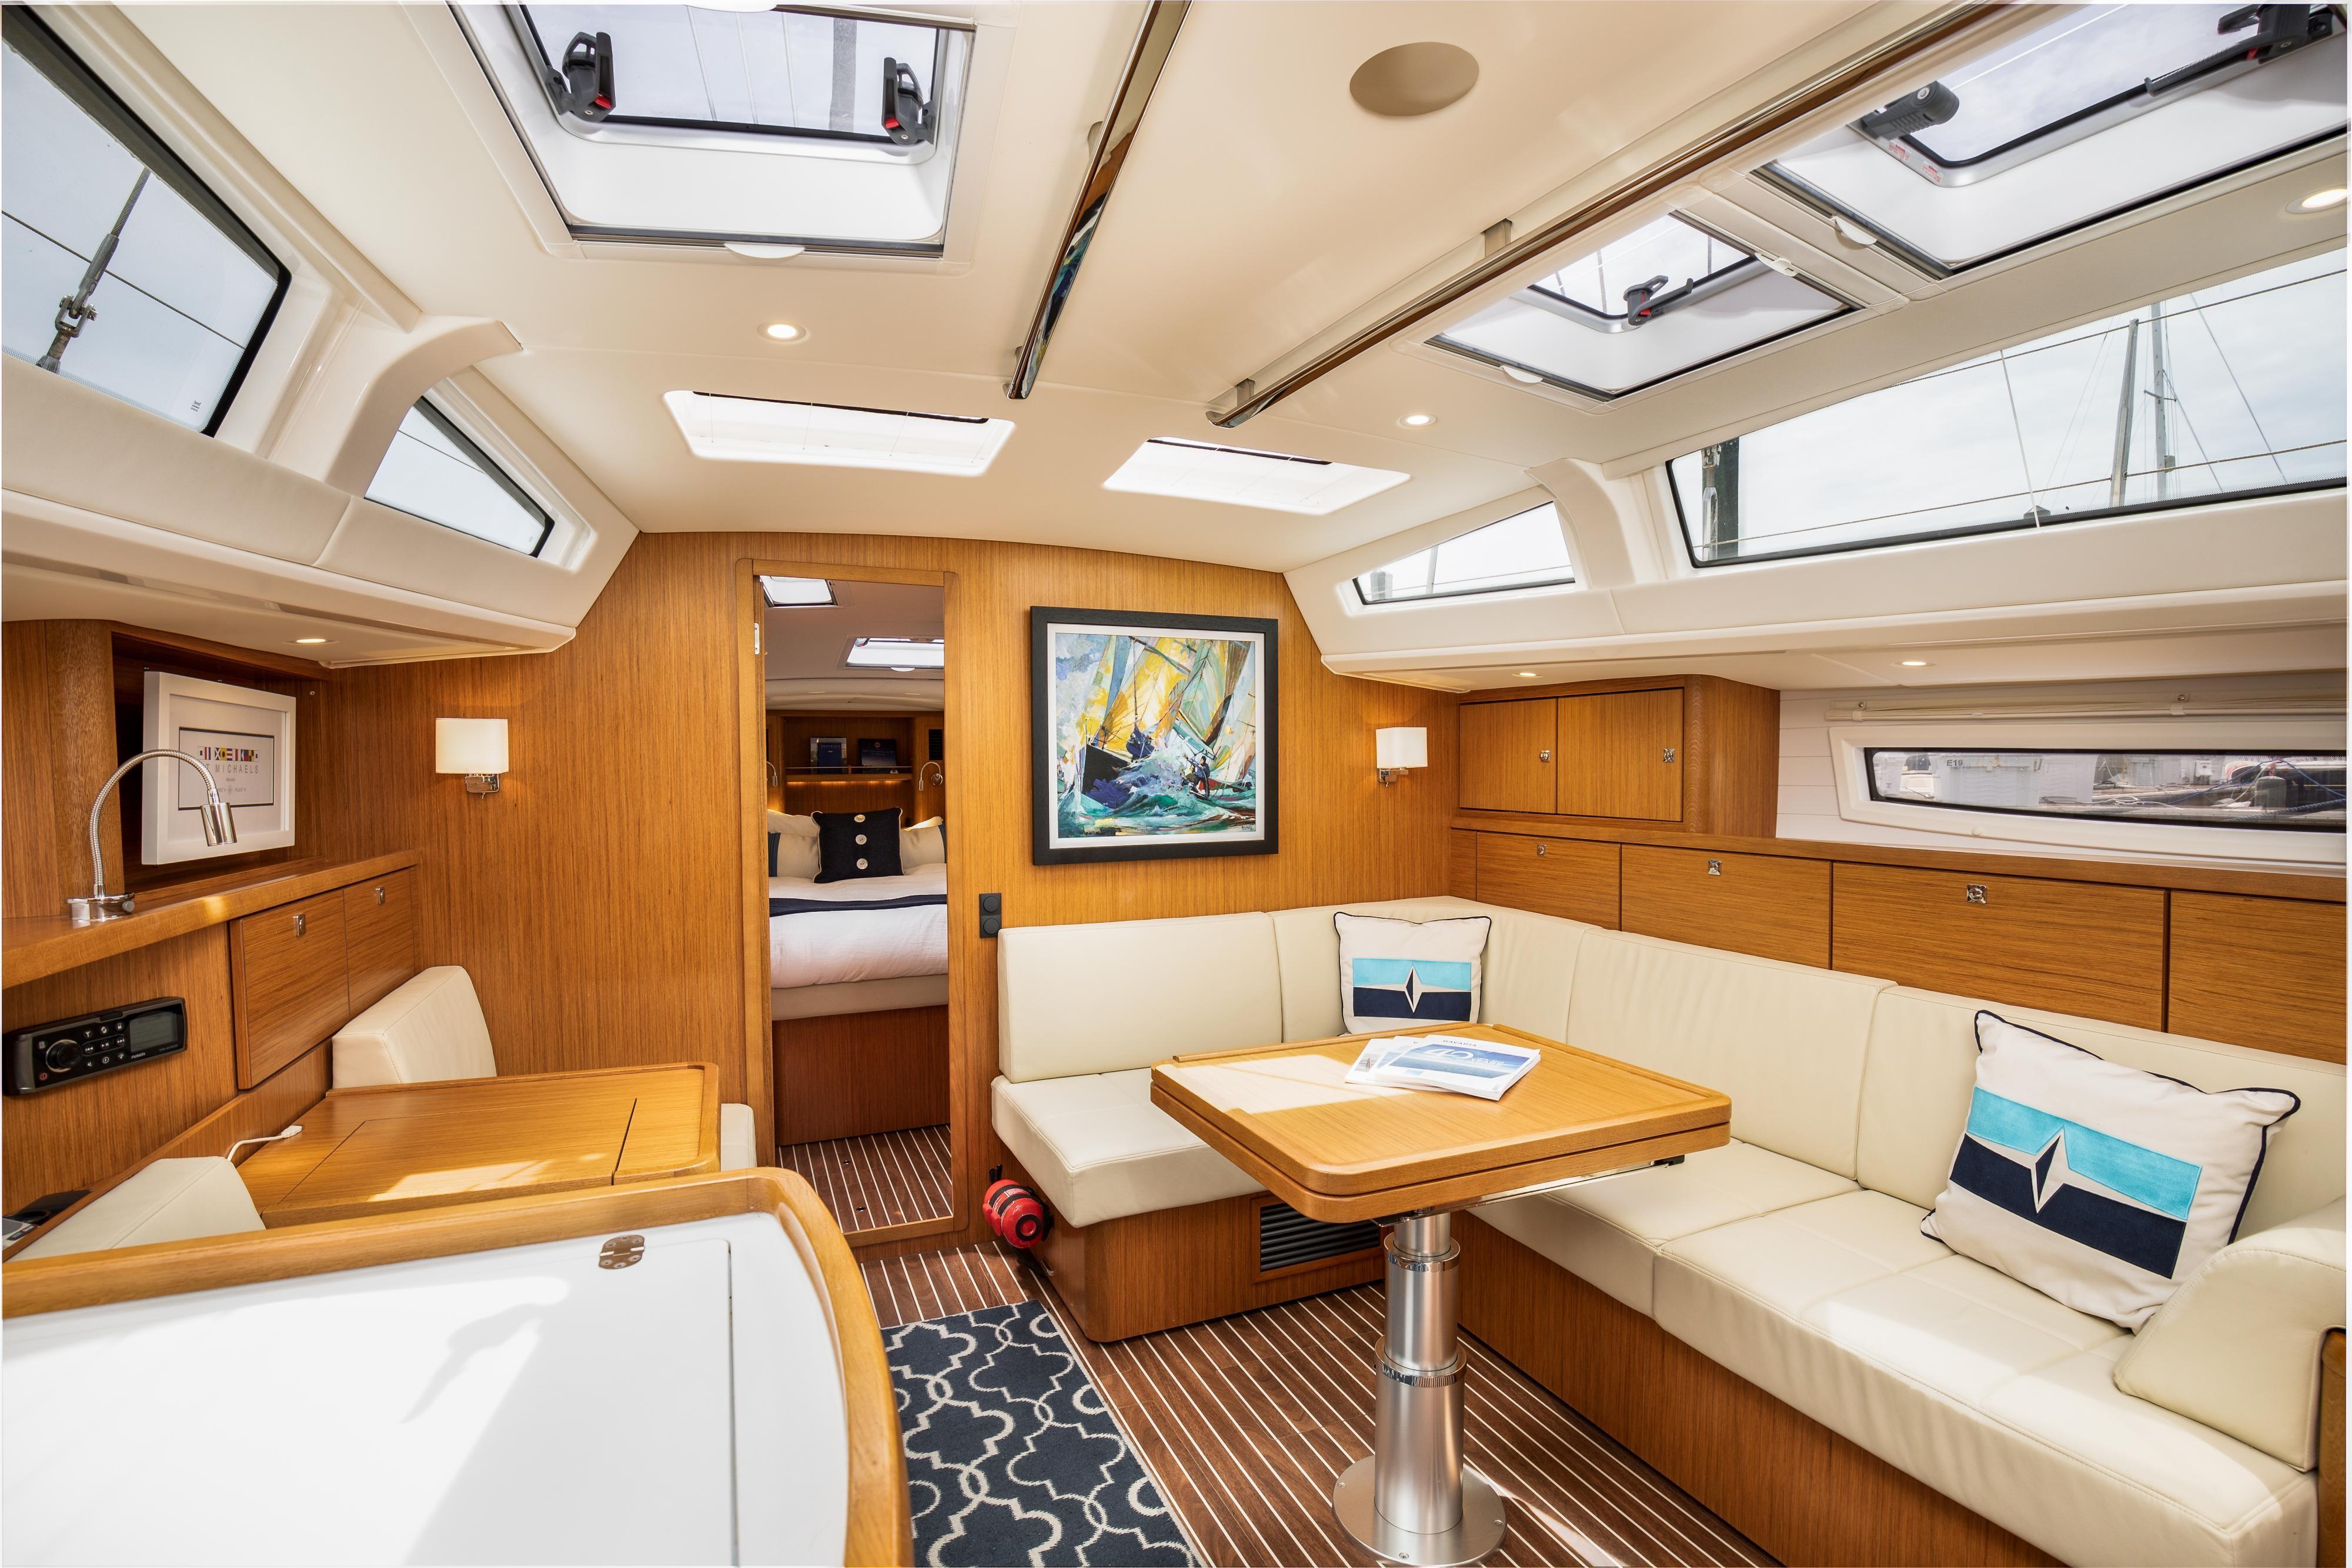 2016, Bavaria Vision 46 For Sale, St  Barts Yachts